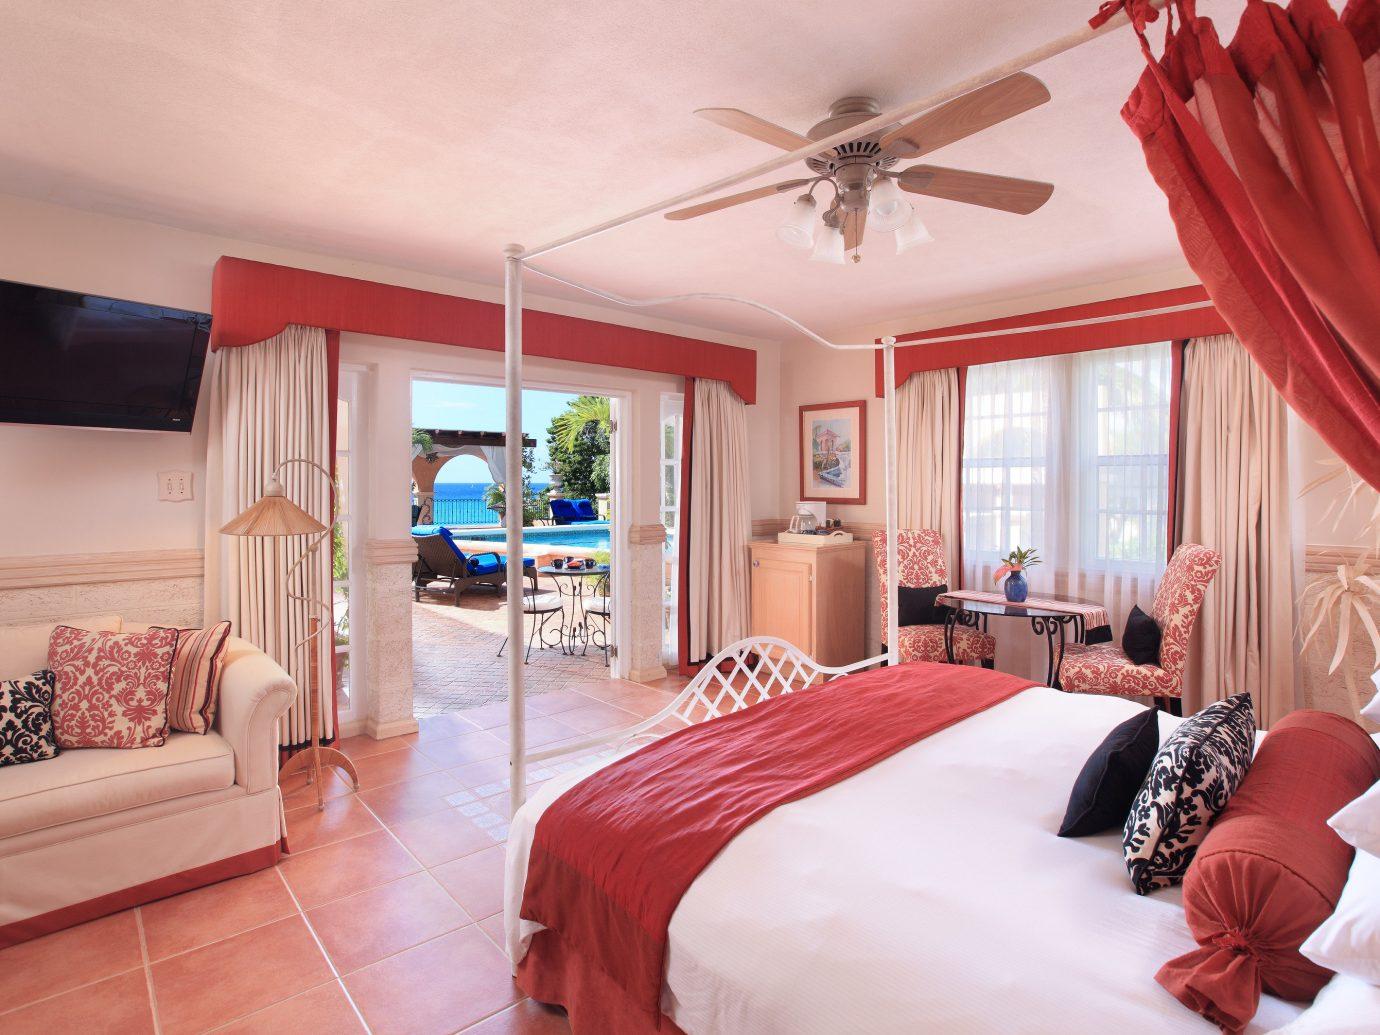 Hotels indoor bed red room sofa floor wall window Bedroom property hotel estate Suite decorated real estate home furniture interior design cottage living room pillow Villa